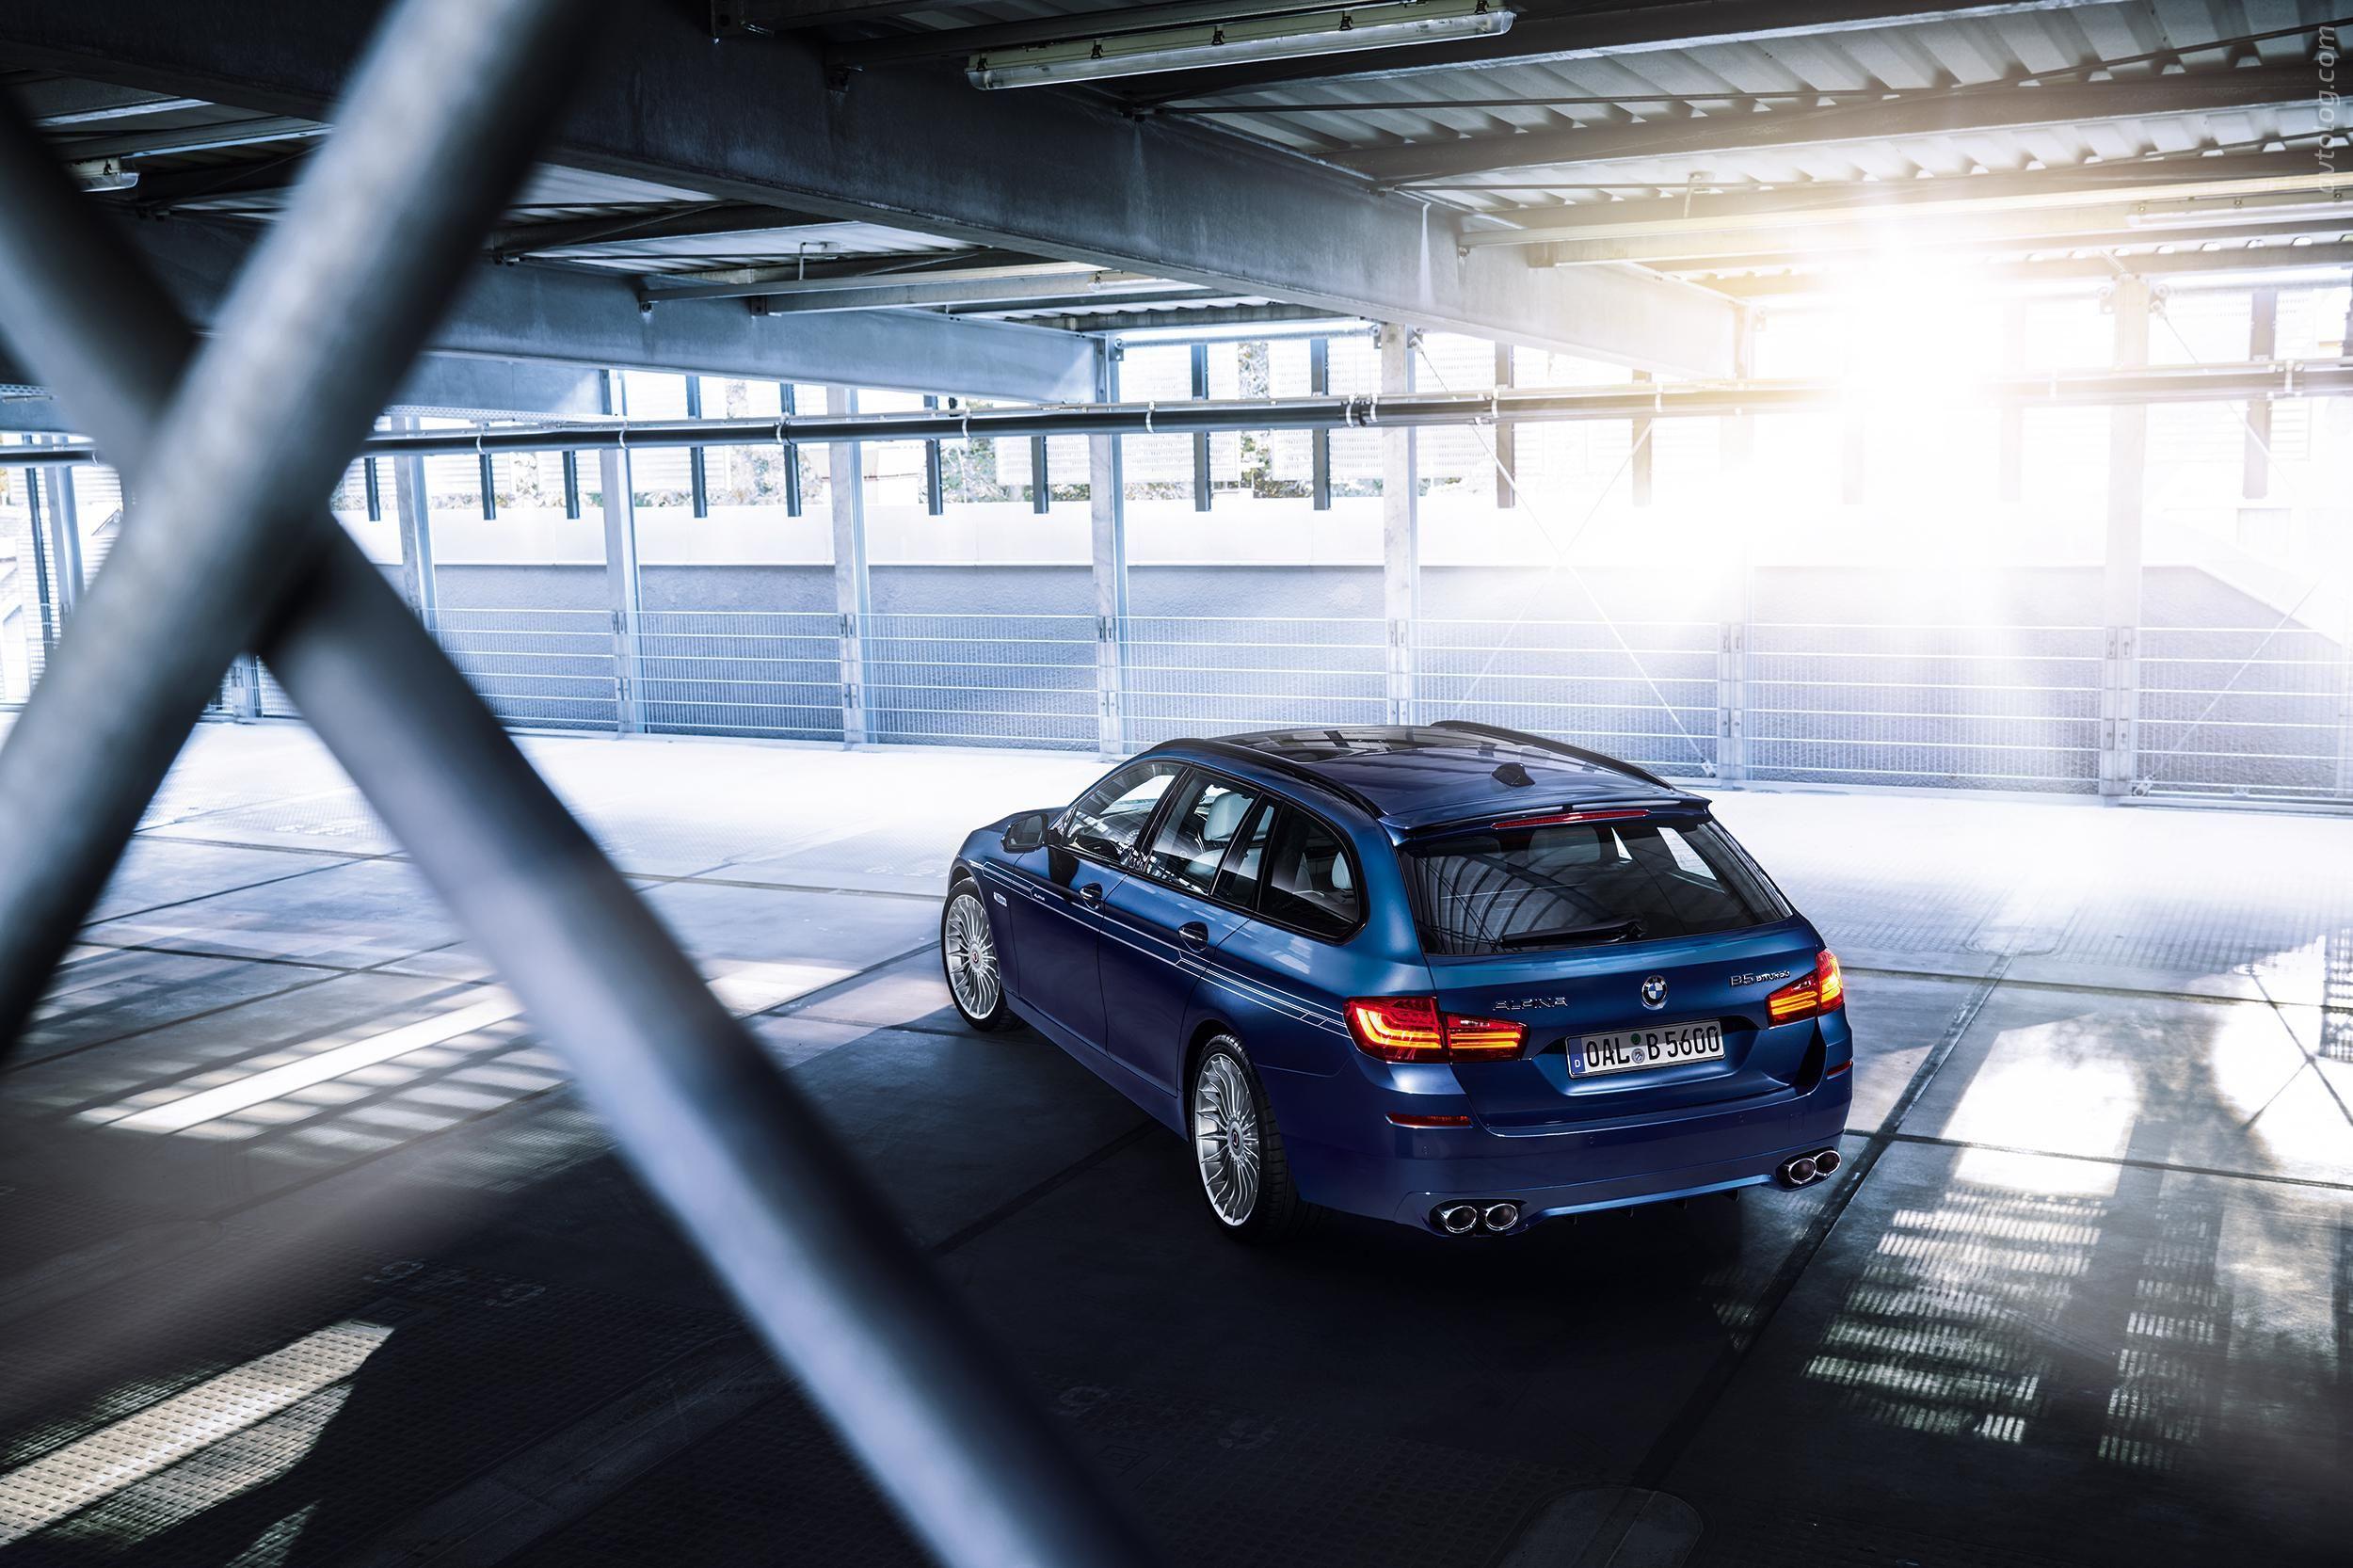 2015 Alpina B5 Bi-Turbo Touring  #Segment_E #German_brands #BMW_F11 #BMW_5_Series #Alpina_B5_Bi_Turbo #BMW #Alpina #2015MY #tuning #BMW_N63 #Serial #CO2 #BMW_F10 #V8 #Akrapovic